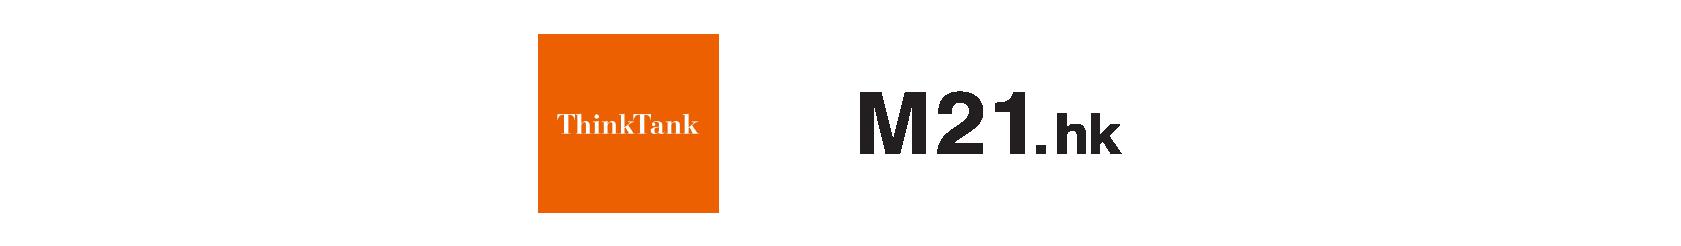 logo_1127-04